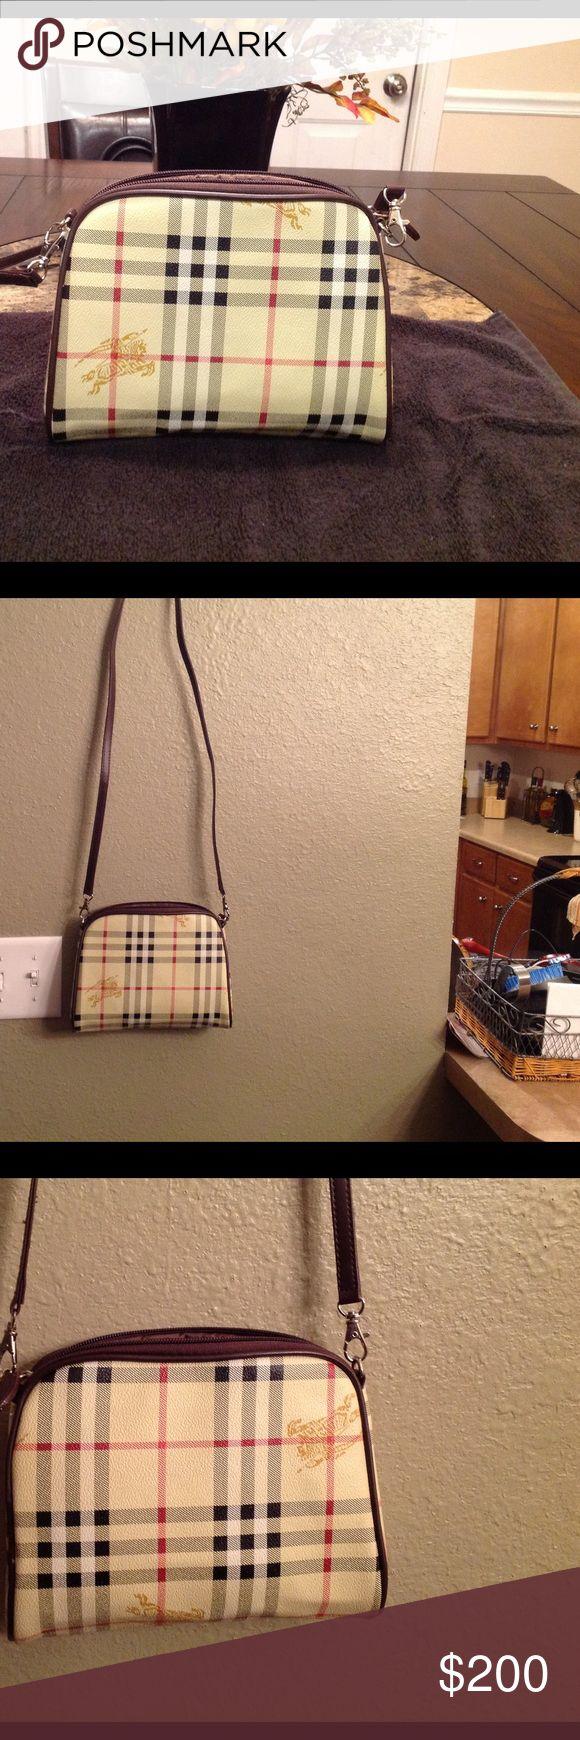 burberry wallet sale outlet mmy2  Authentic, vintage Burberry purse 9